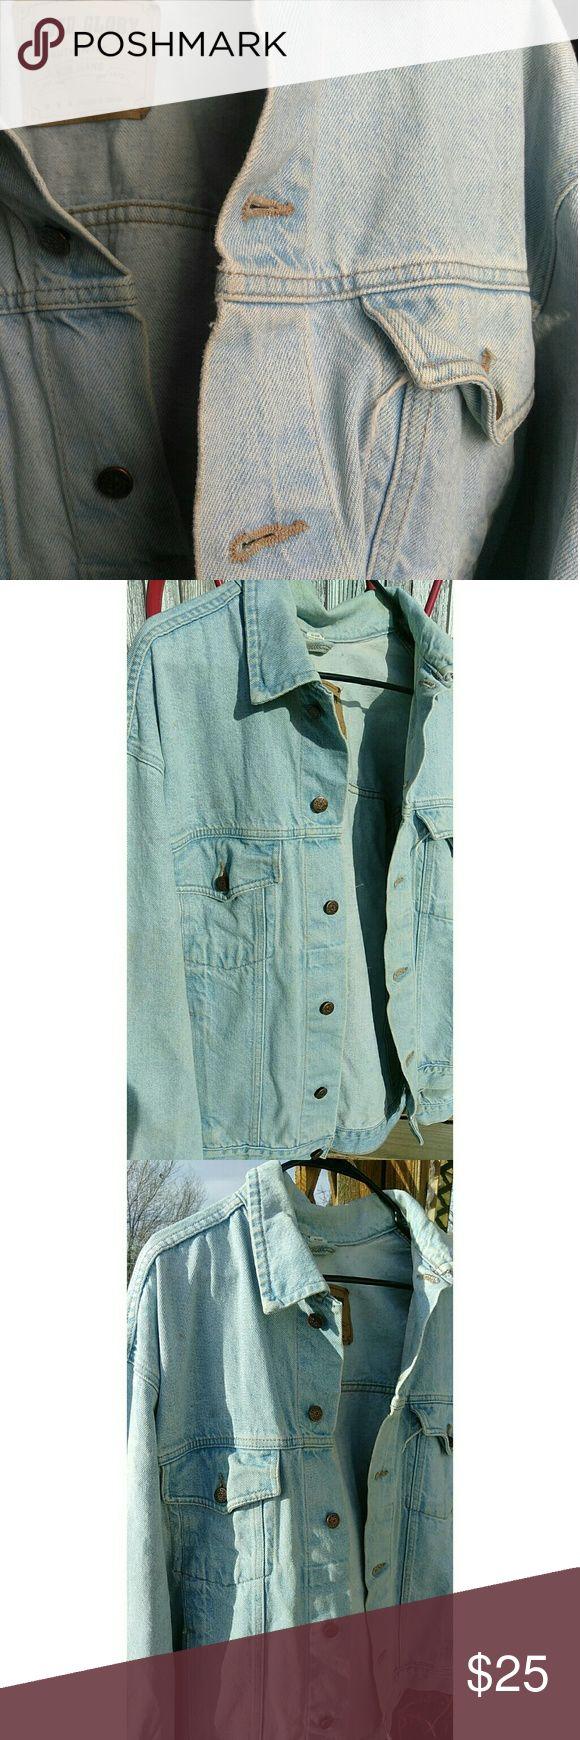 Light blue jean jacket Used. Needs to go asap! Faded Glory Jackets & Coats